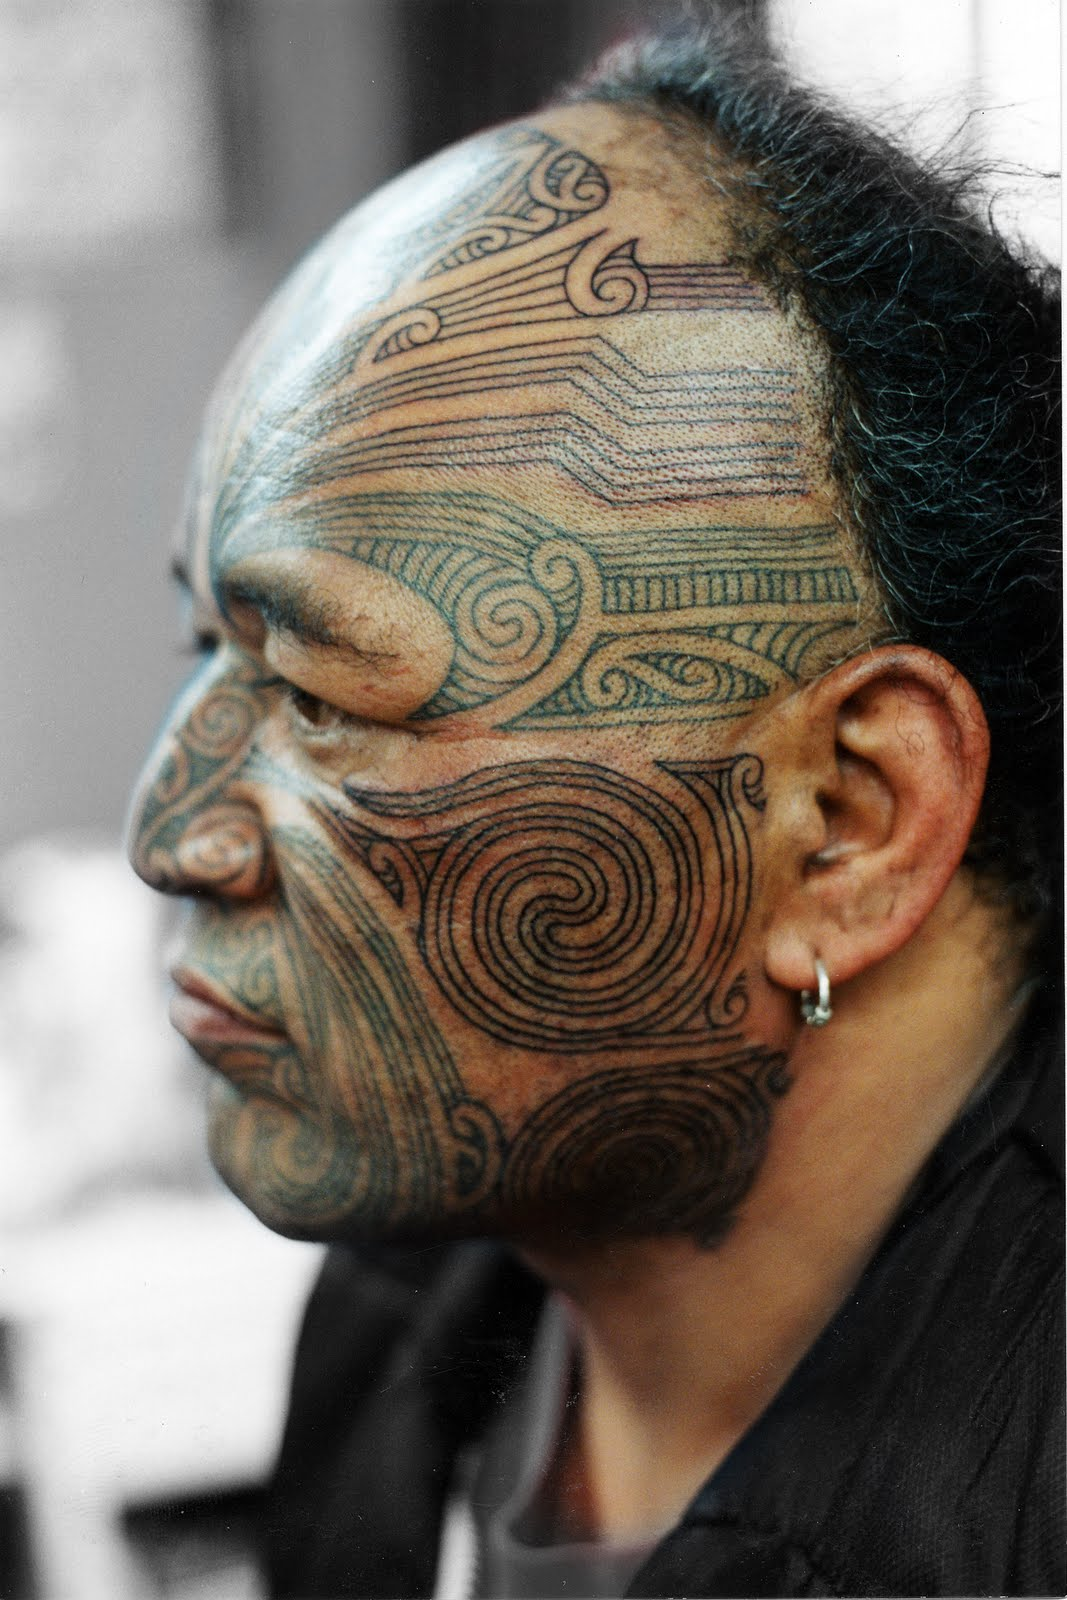 Maori Facial Tattoo: Imogen Smid's Final Illustration Exam Blog: Back To The